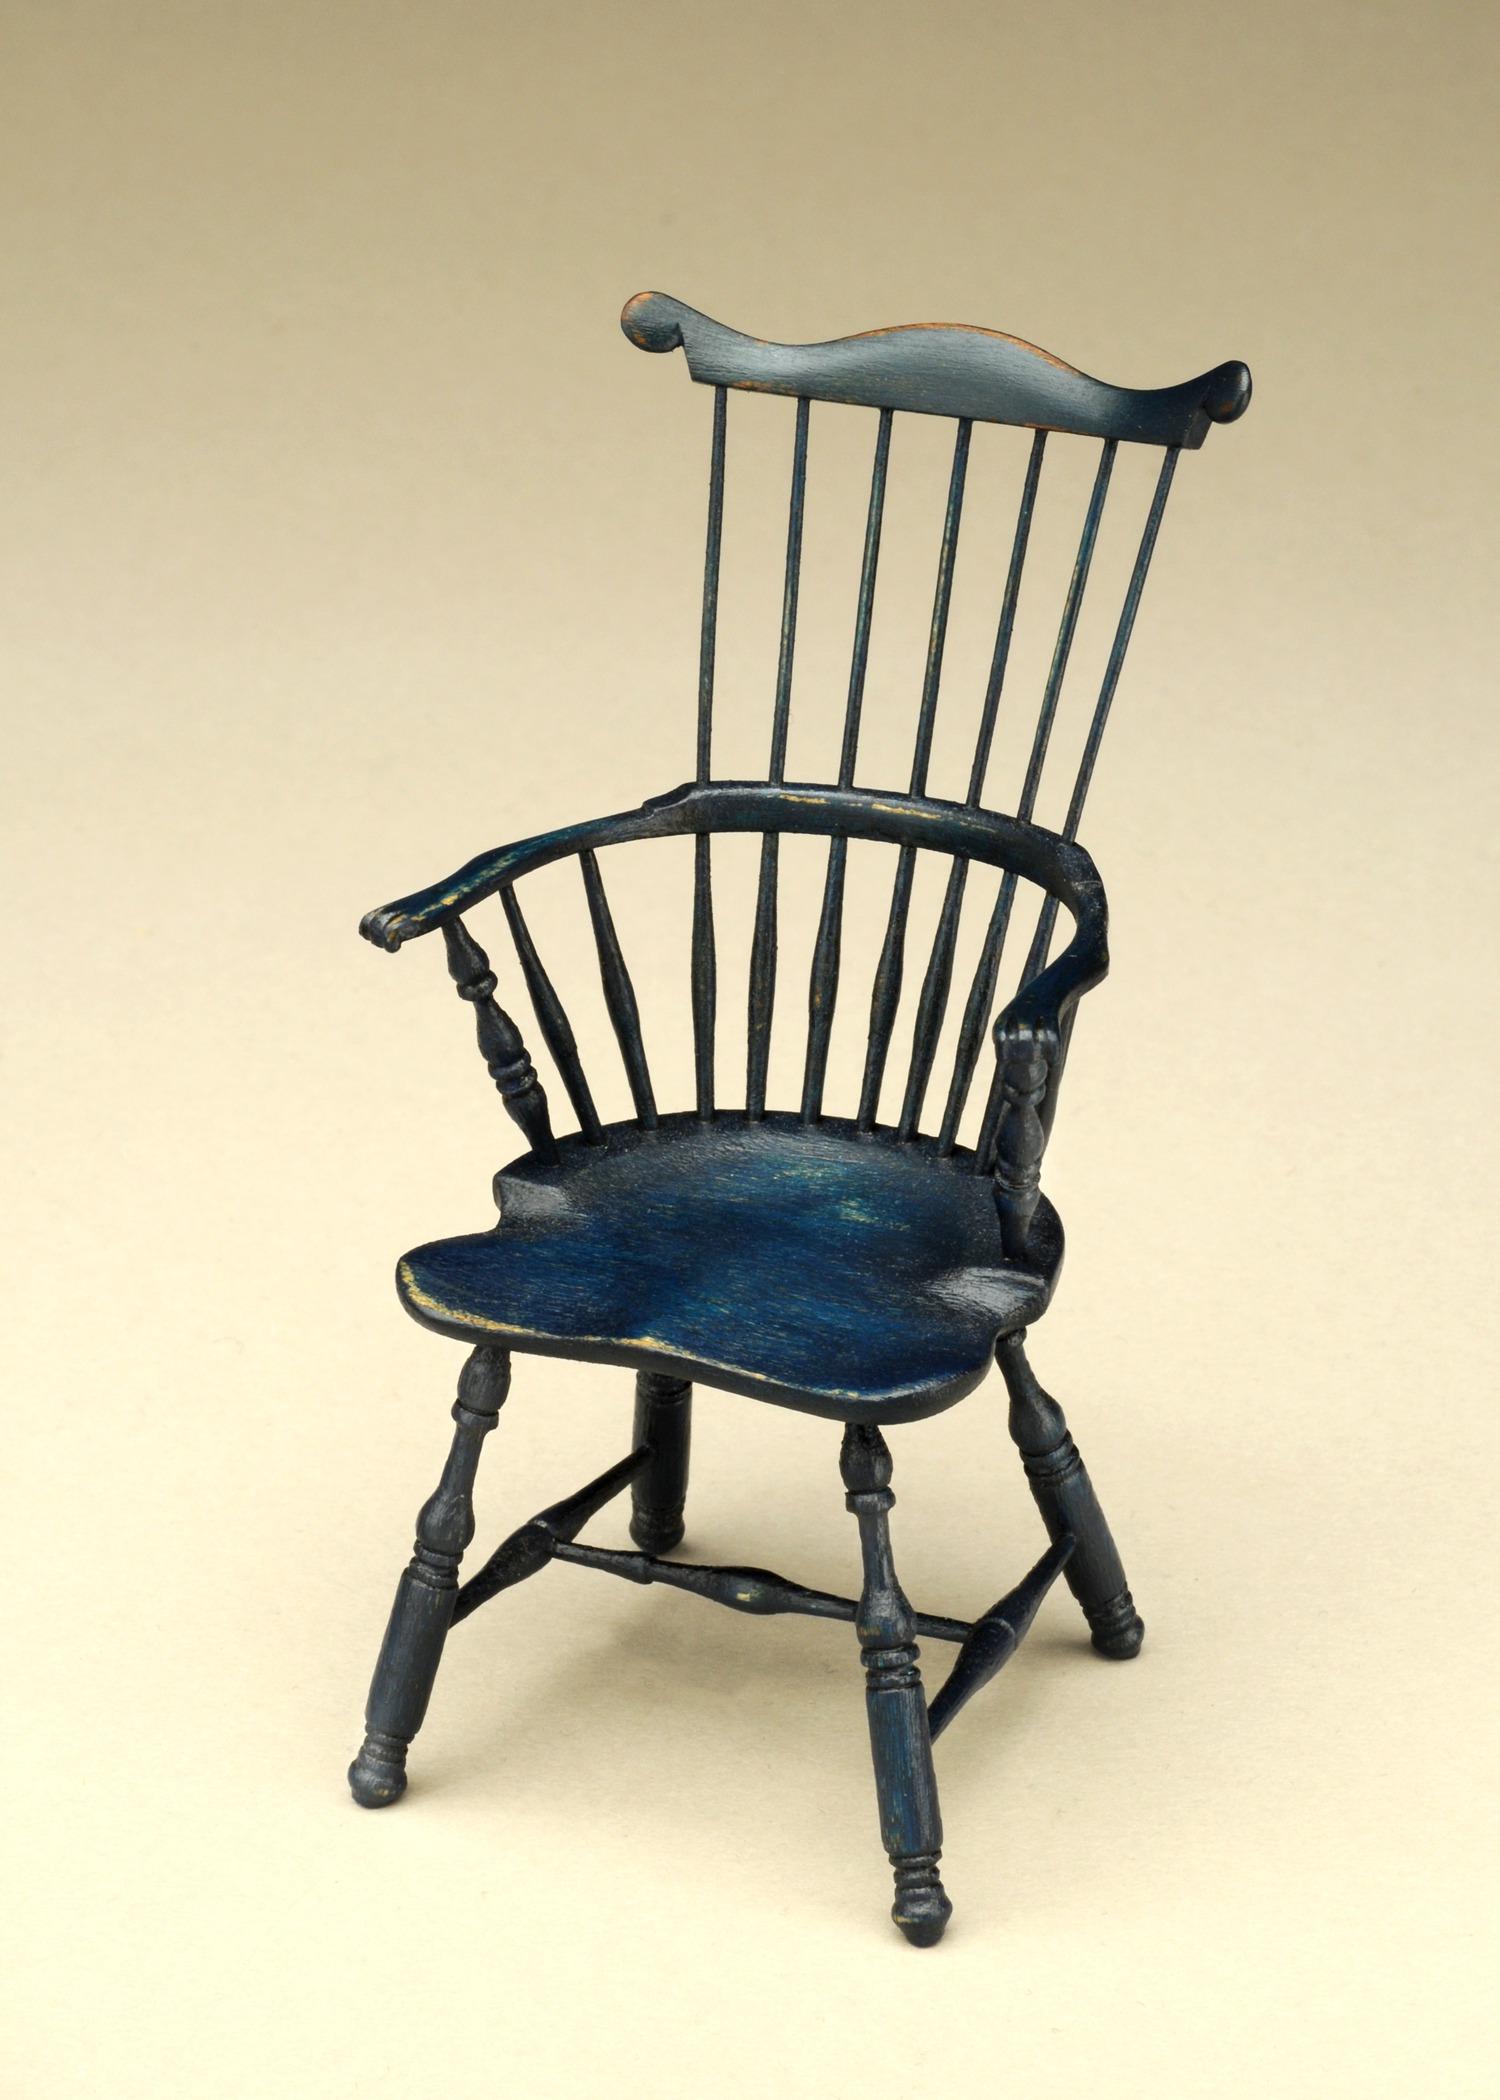 Murphy417.Comb-back Armchair - Copy-p1afi13mrvtqd1dp18pg1ue3ul.jpg